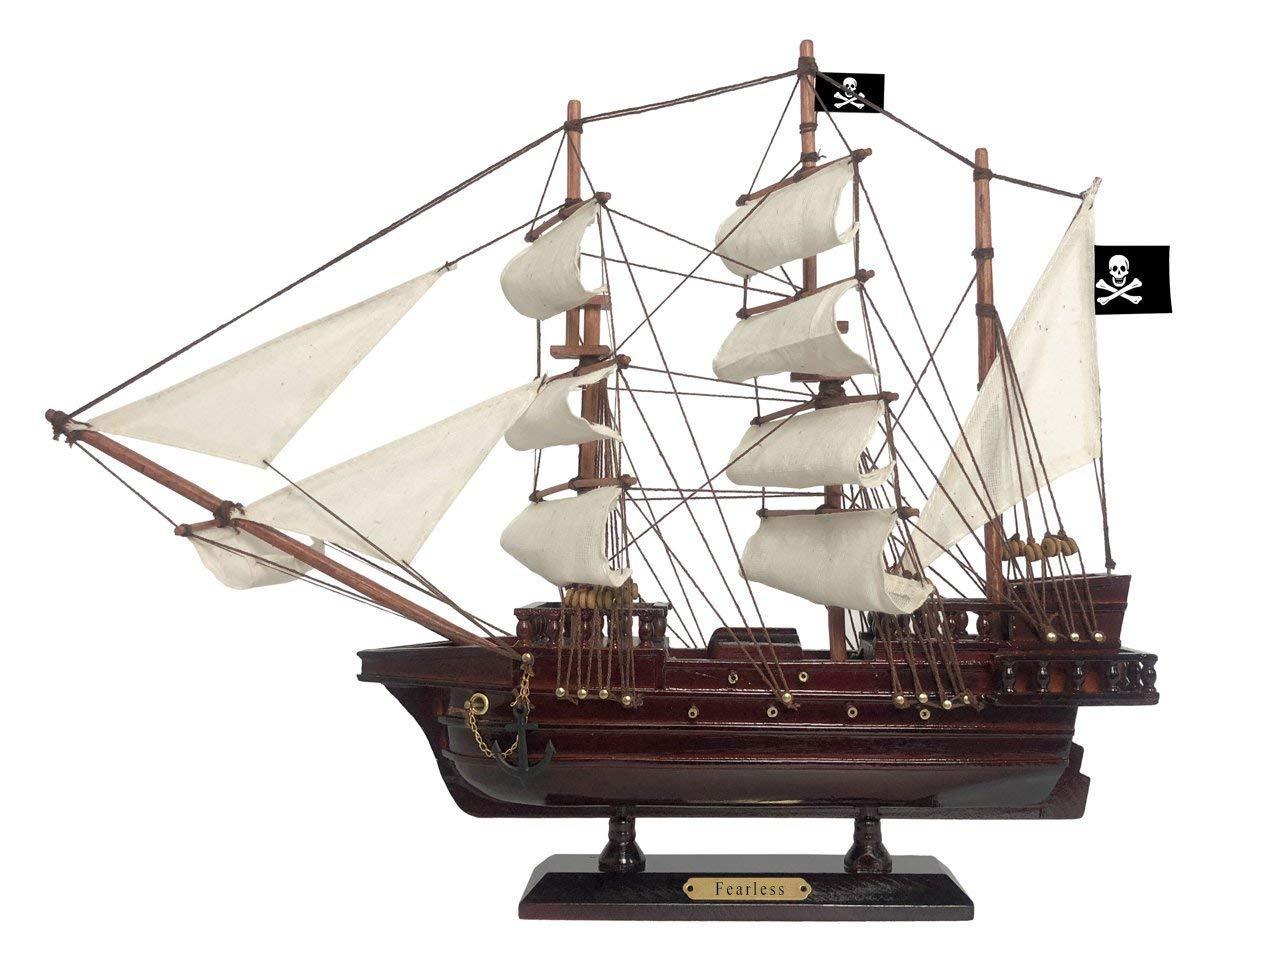 Hampton Nautical Wooden Fearless White Sails Pirate Ship Model 20'' - Ship Decor - Model Boat